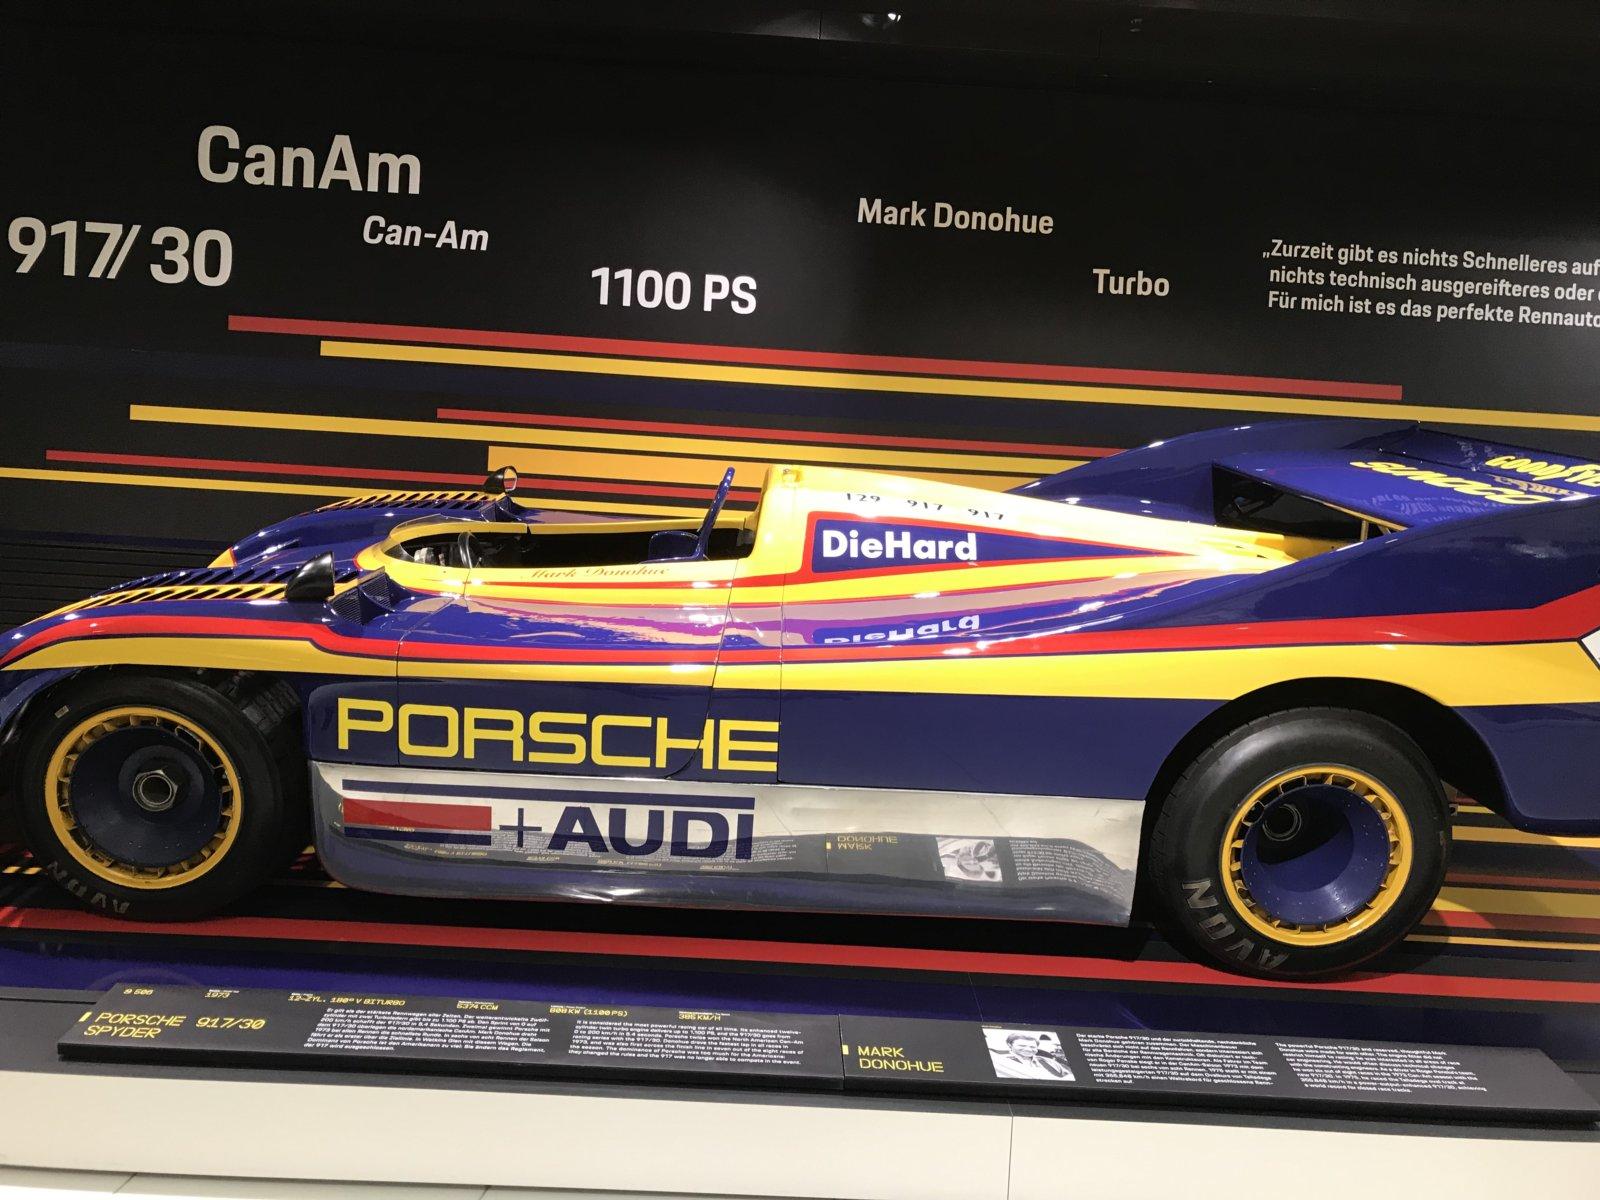 07-28 Porsche Race Car 06